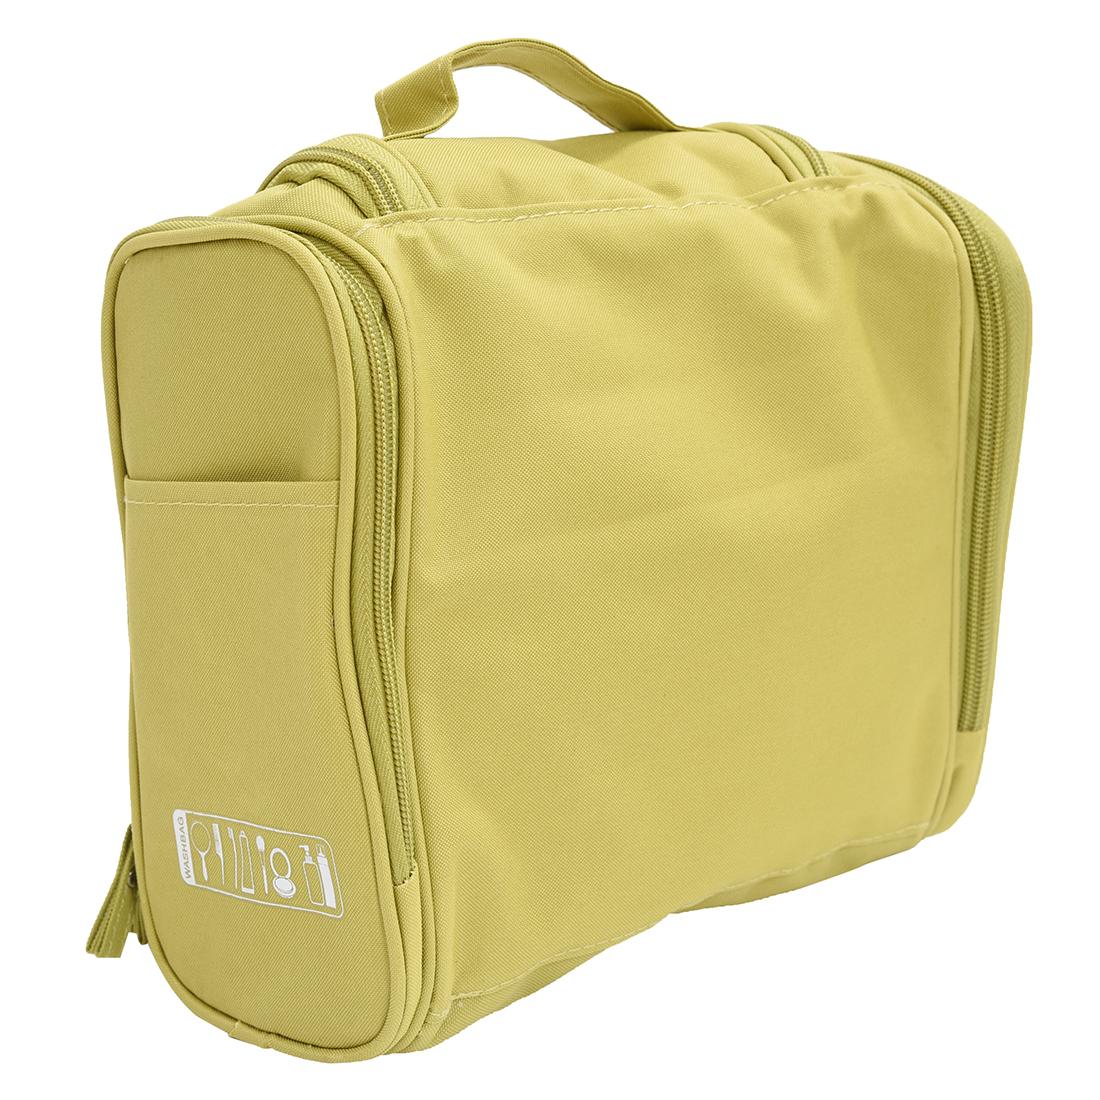 Travel Gro Bag